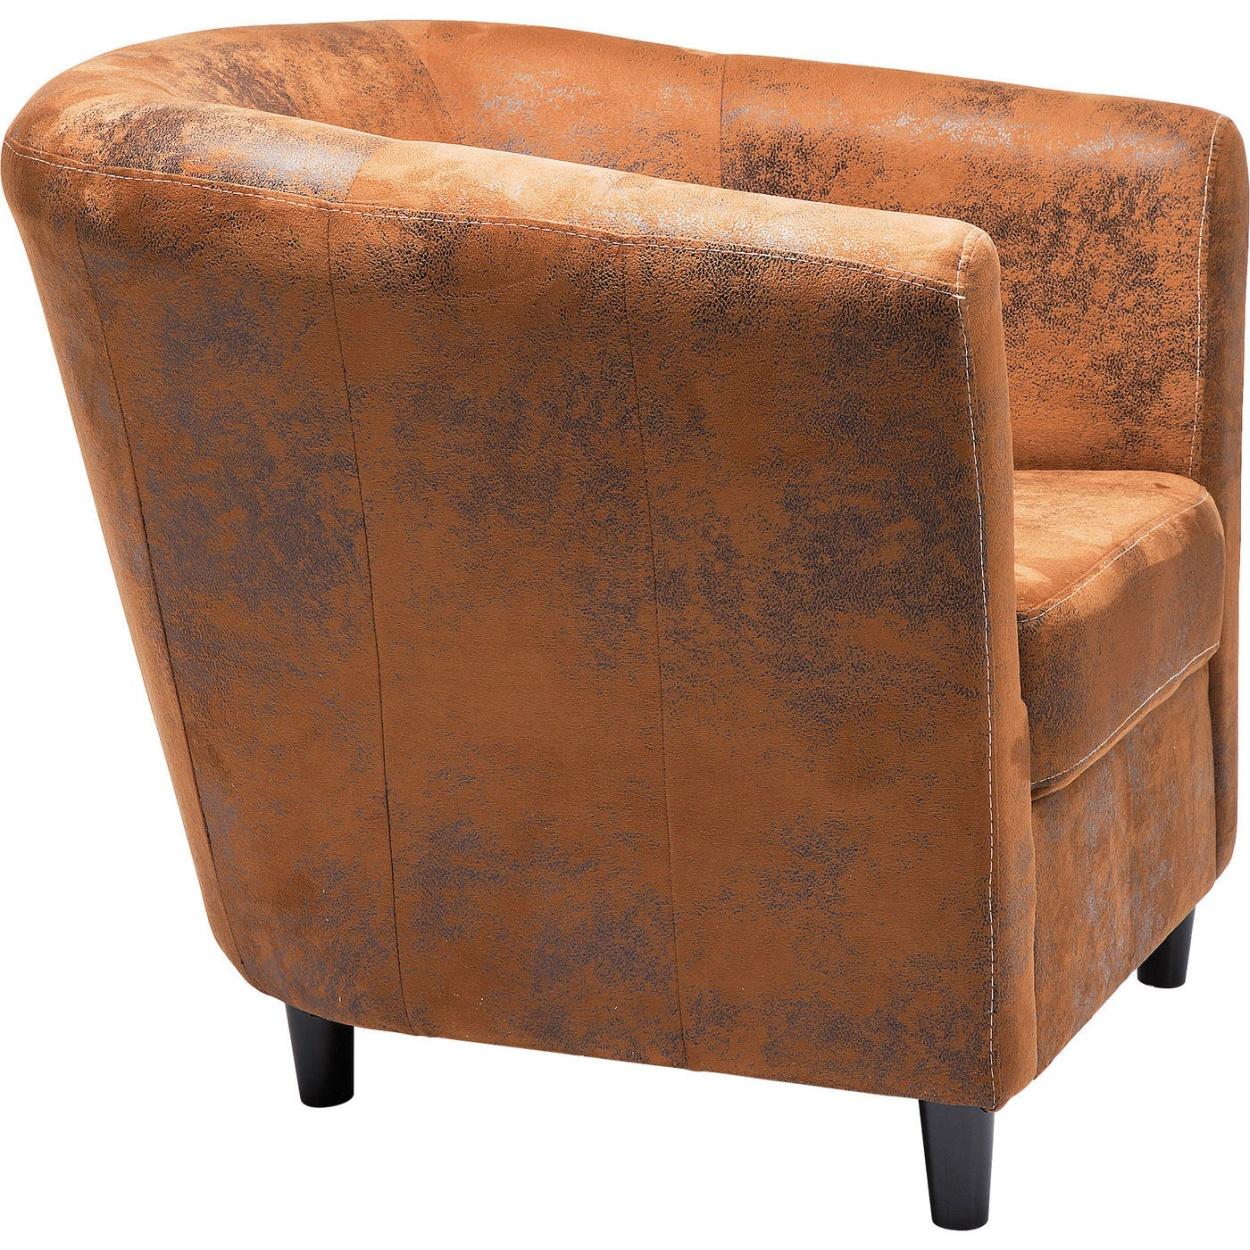 Kare Design Fauteuil Africano Vintage Eco - Bruin